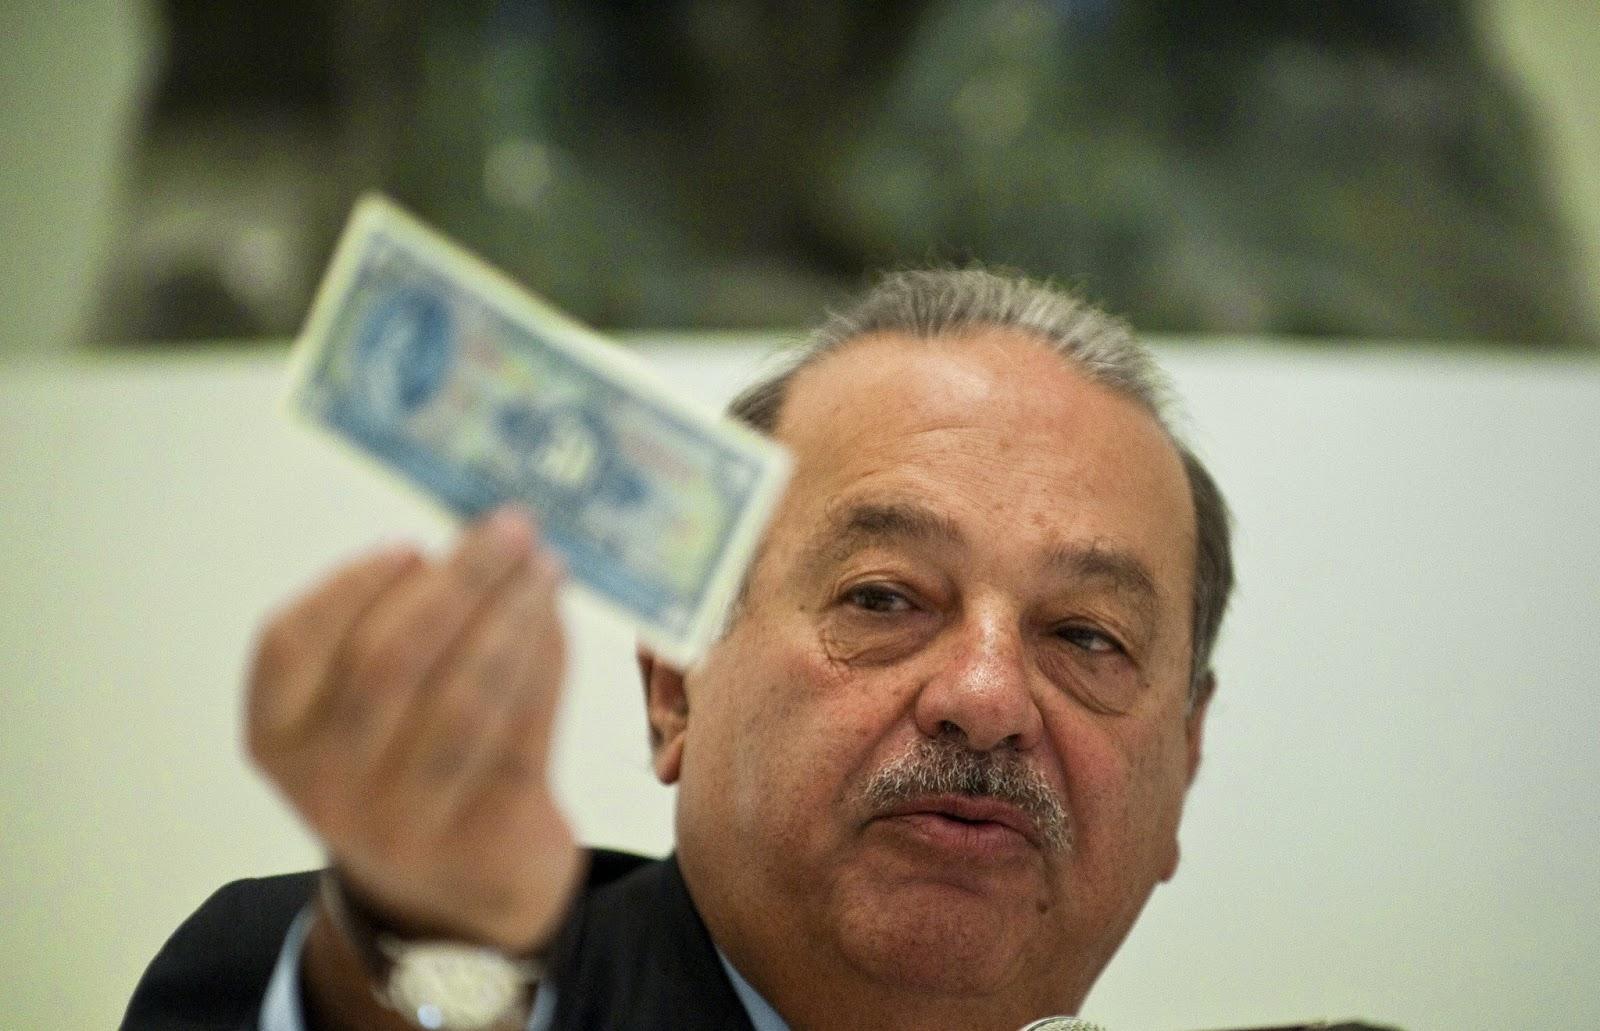 "<img src=""http://3.bp.blogspot.com/-yenwvMEkYQ8/U4zfhM9-eJI/AAAAAAAAAGE/fPiX7mHs2To/s1600/carlos-slim.jpg"" alt=""Richest Man in the World"" />"